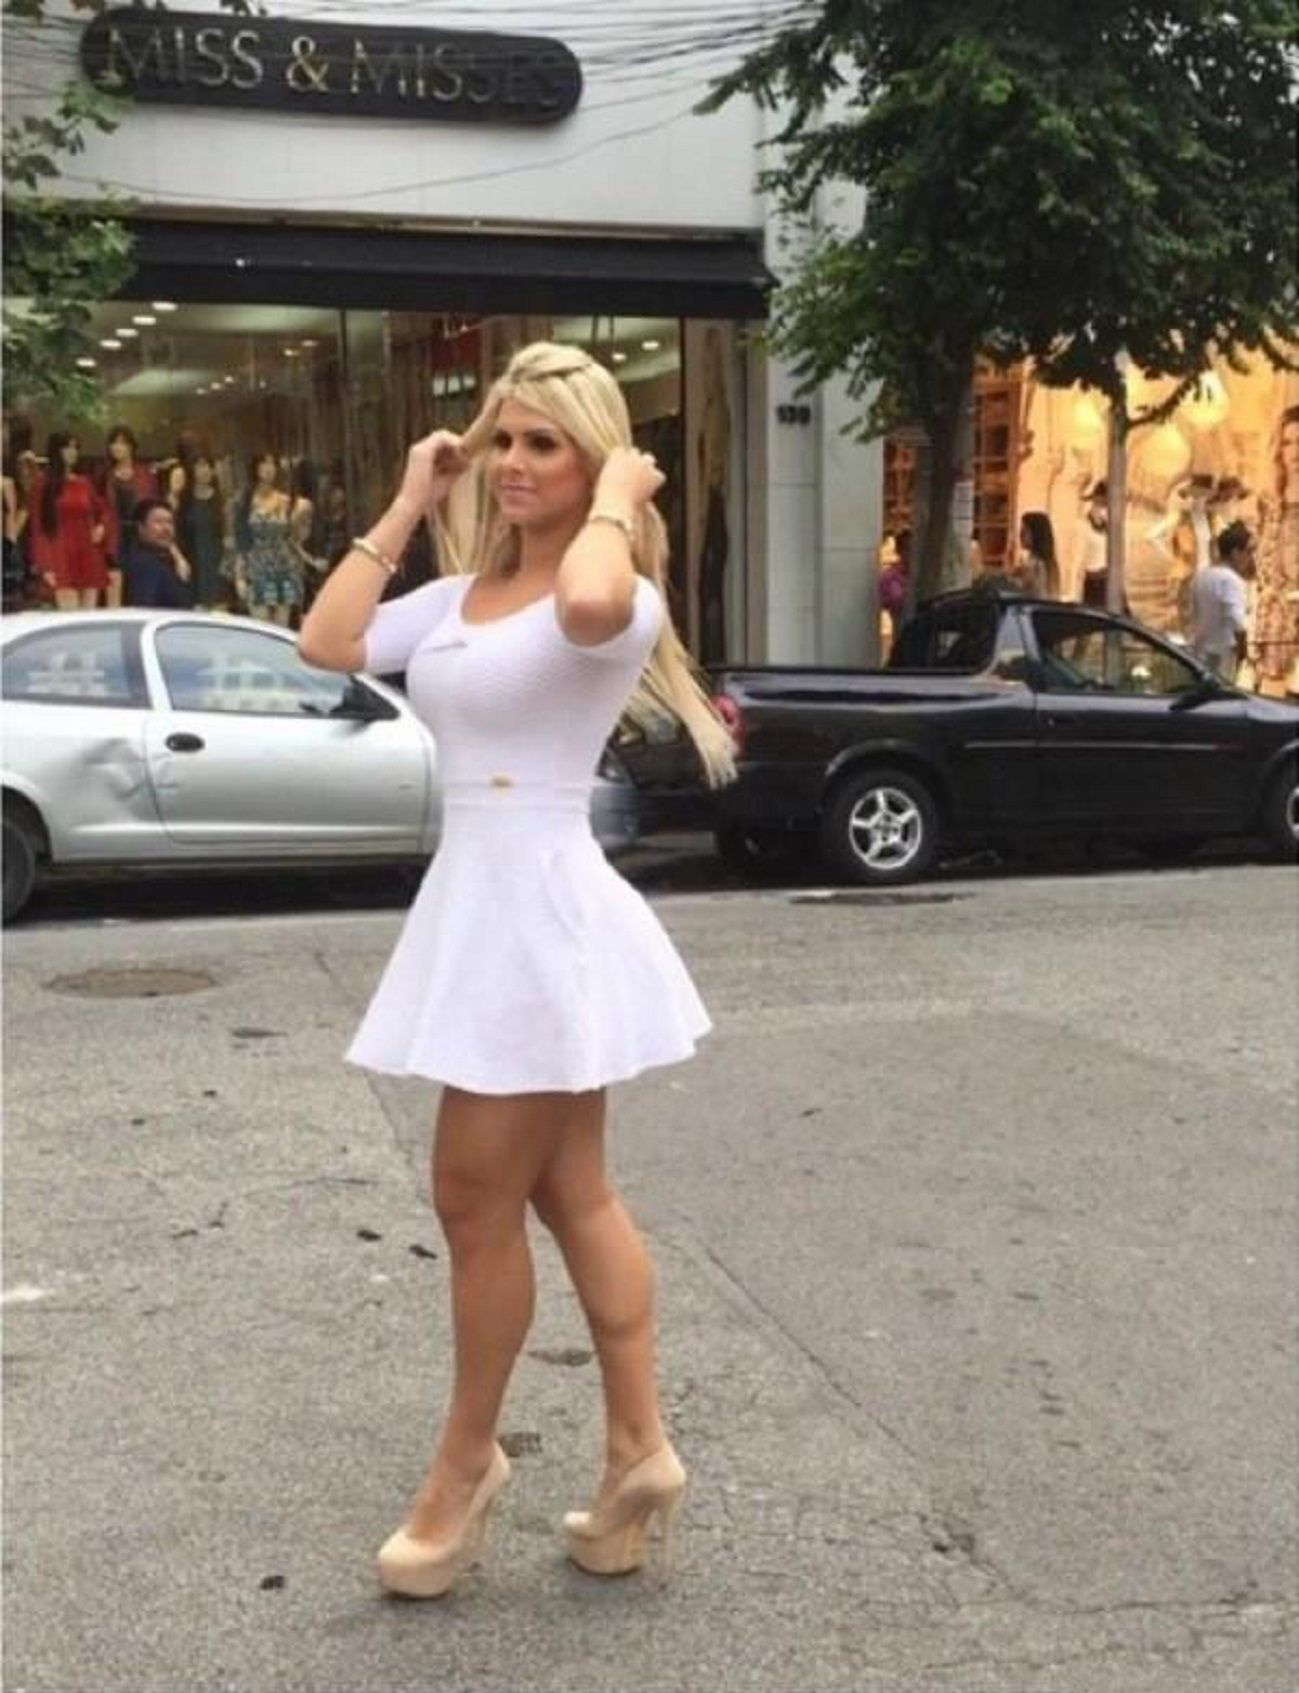 julia nunes big booty & big boobs blonde | girls & cars | pinterest